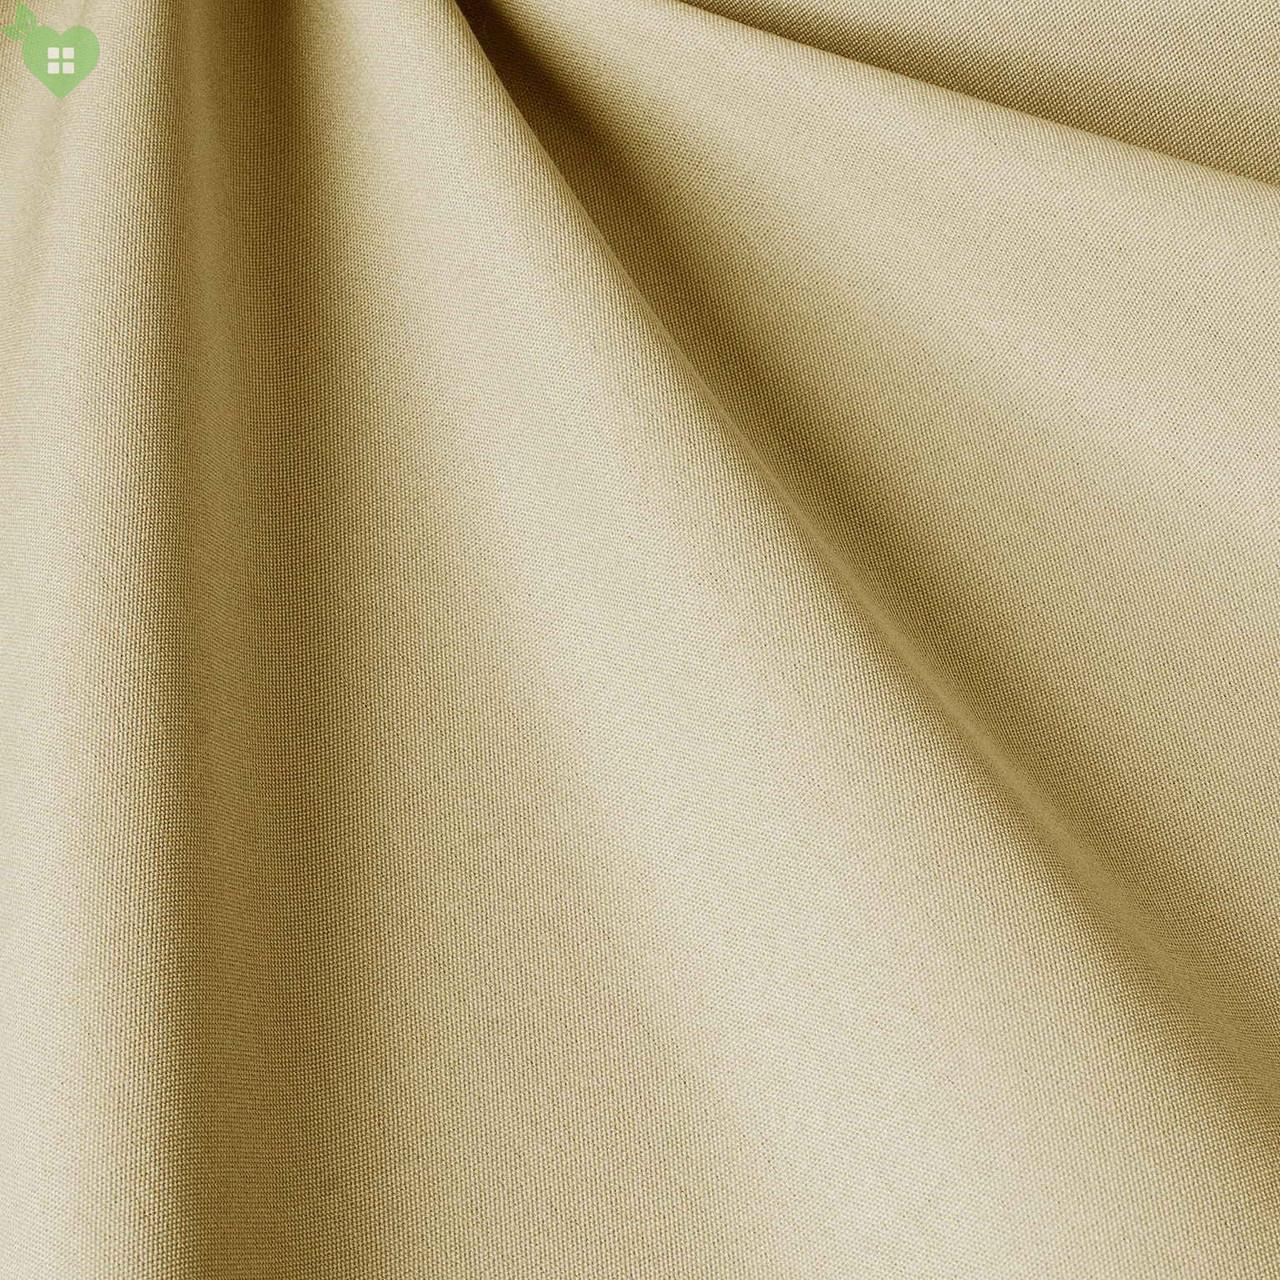 Ткань для улицы: Дралон (Outdoor) 83389v17